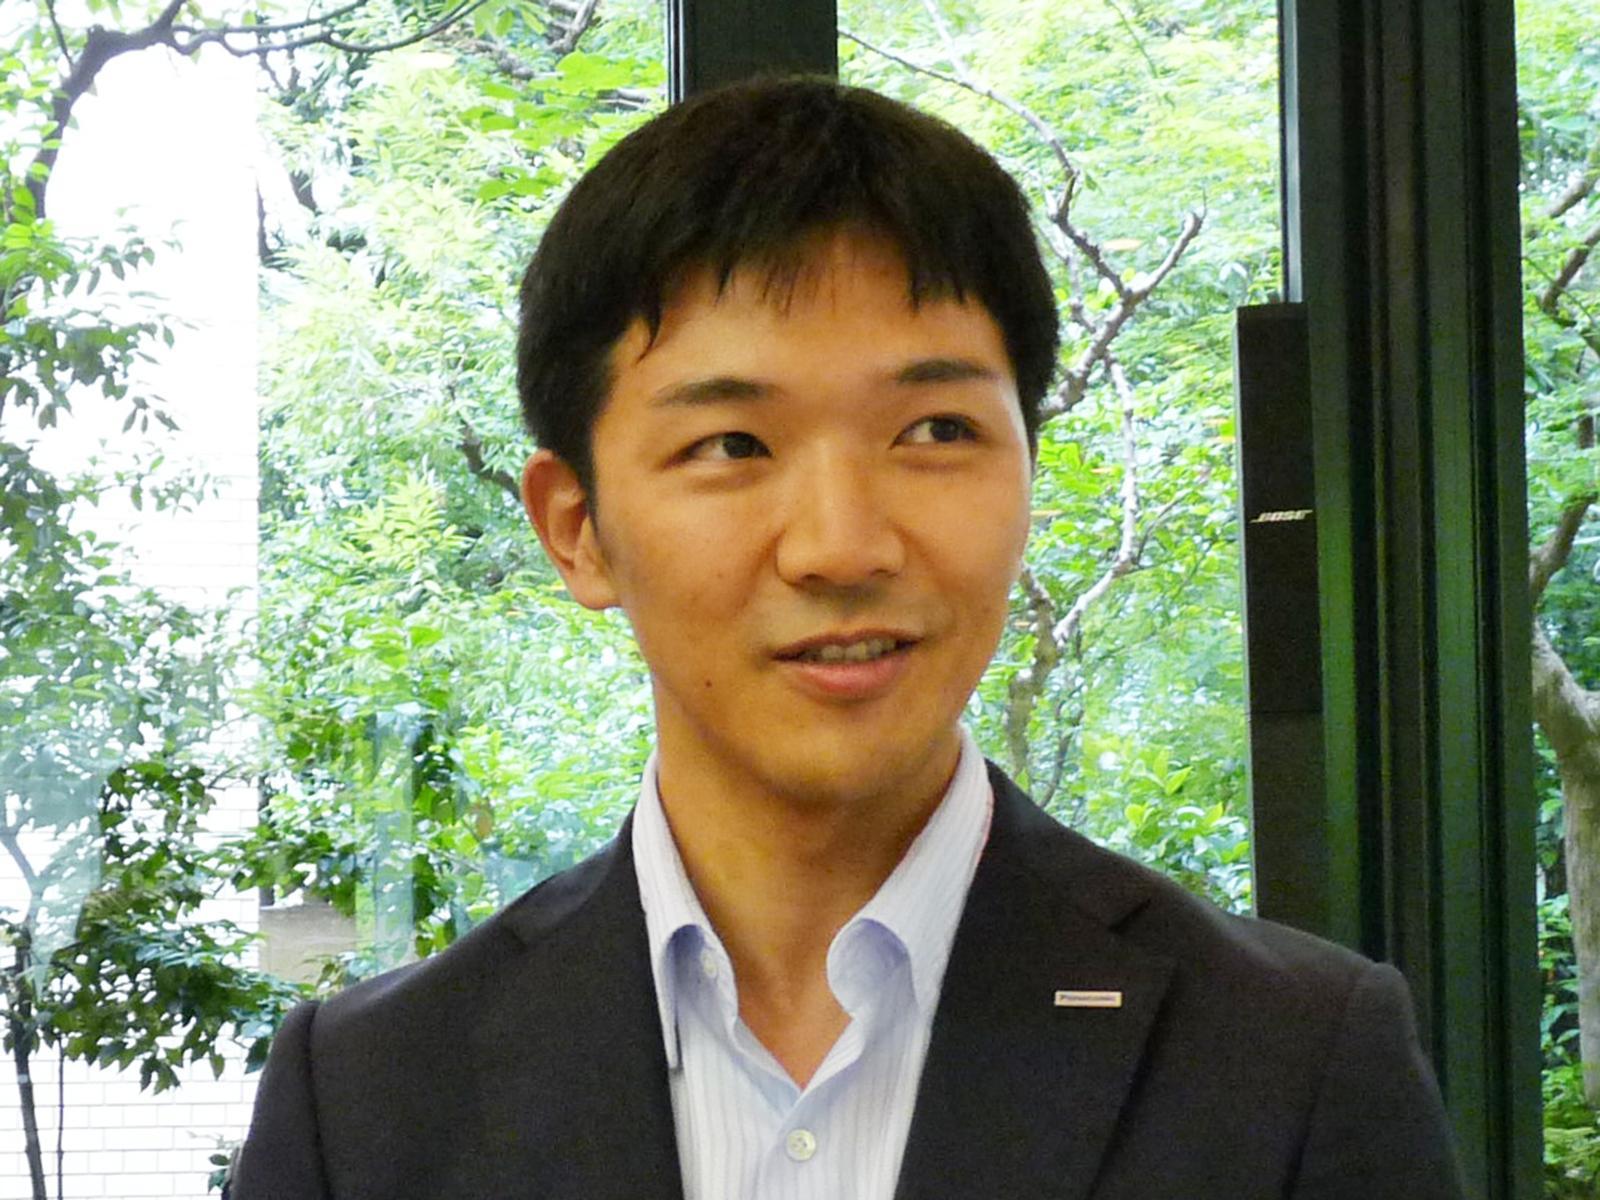 image of Koichi Kusukame